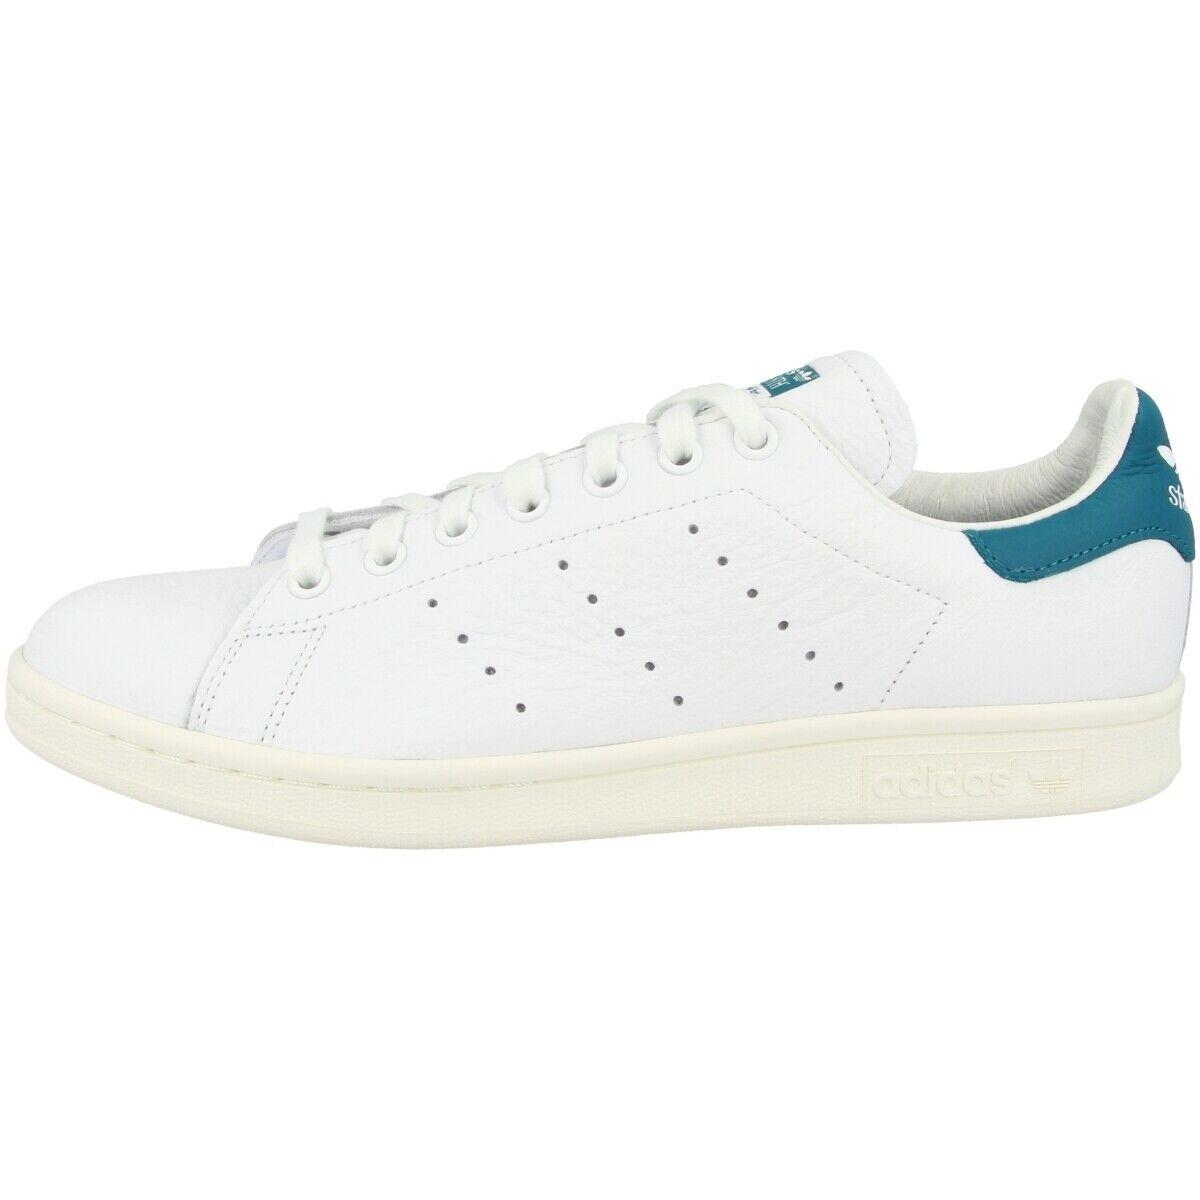 Adidas Stan Smith scarpe  Woman Retro Leisure scarpe da ginnastica bianca ef9321  preferenziale